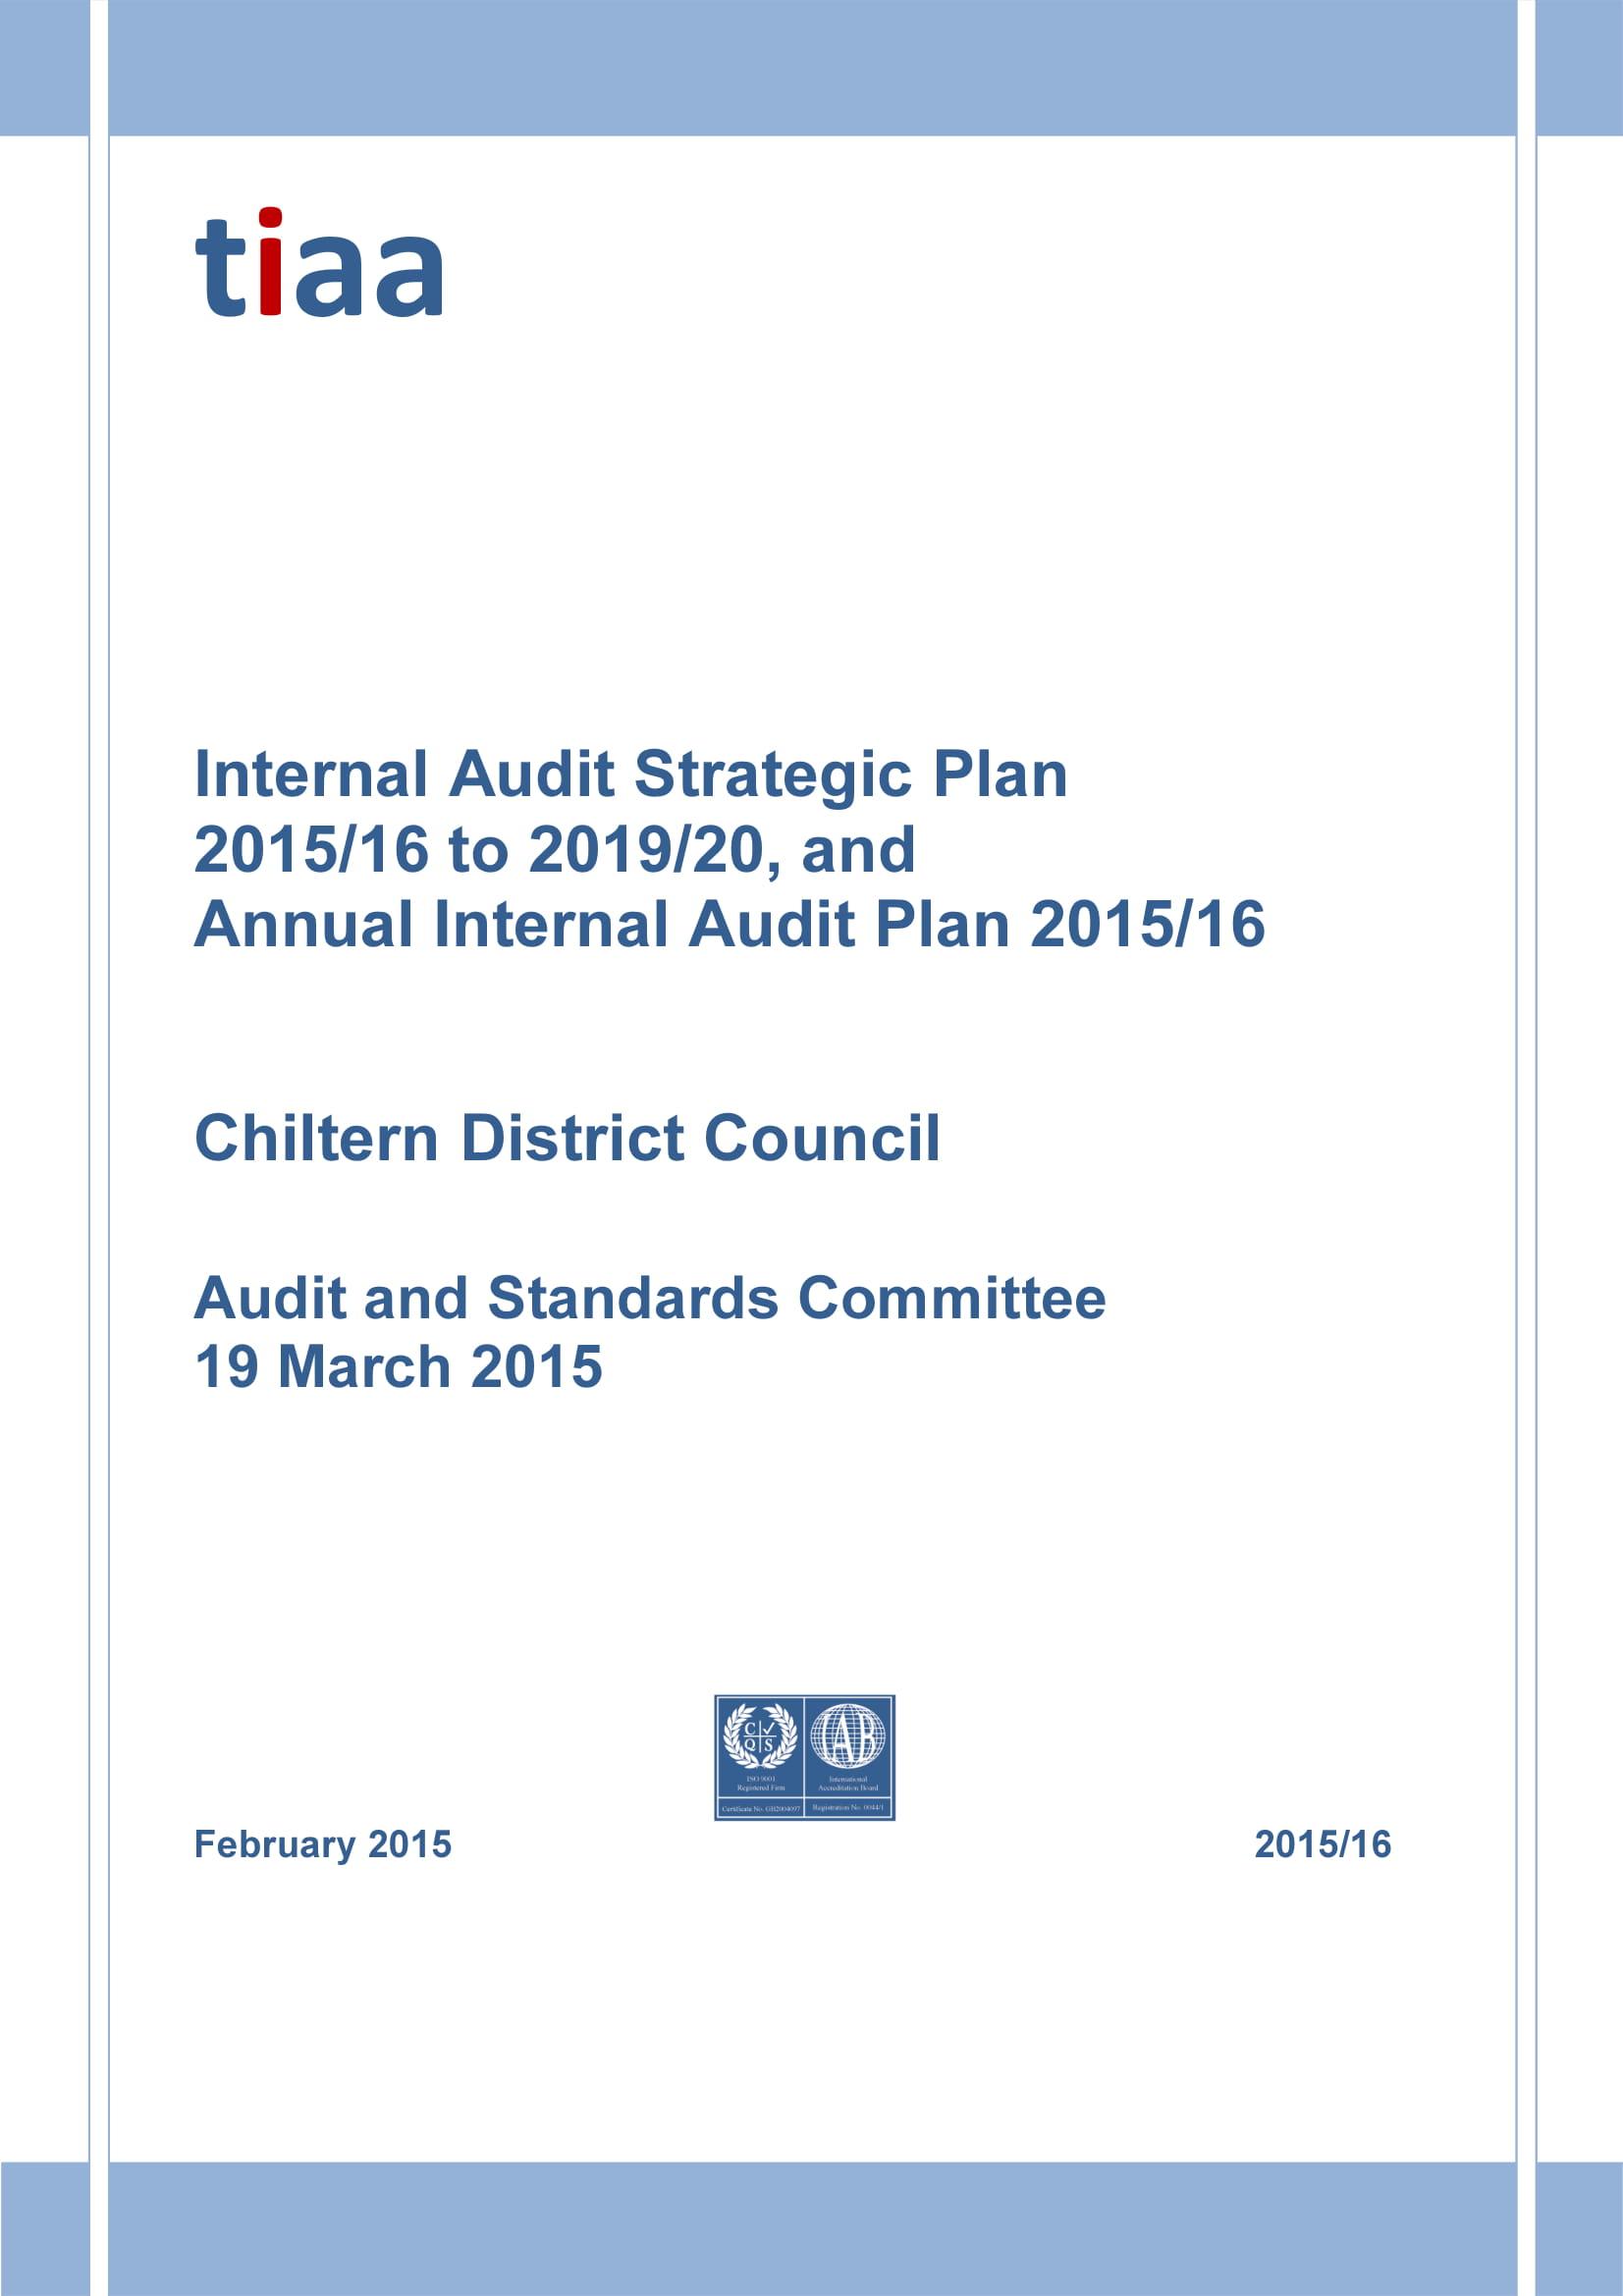 comprehensive internal audit strategic plan example